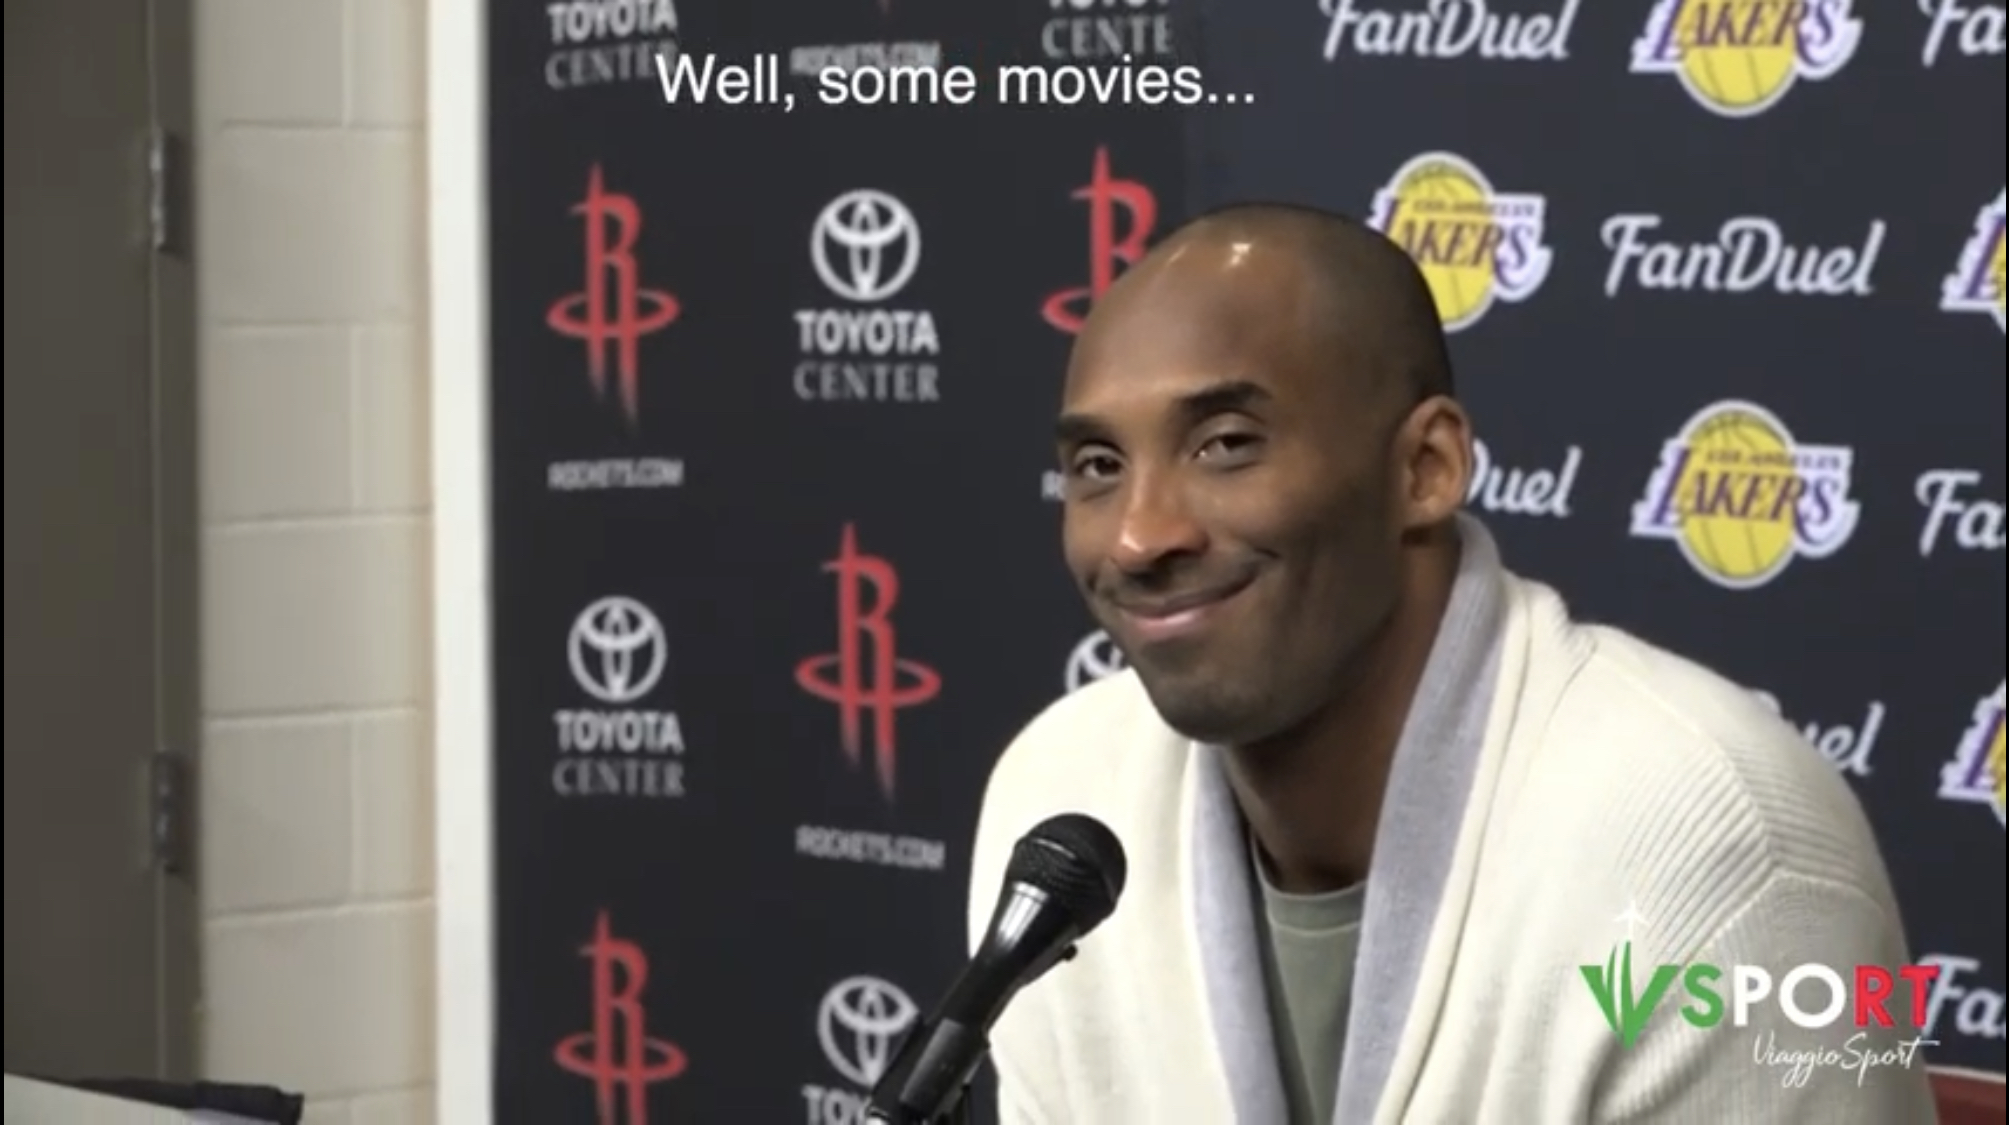 Kobe's Secret Scoop In Italian: My Next Job? Movies | USA